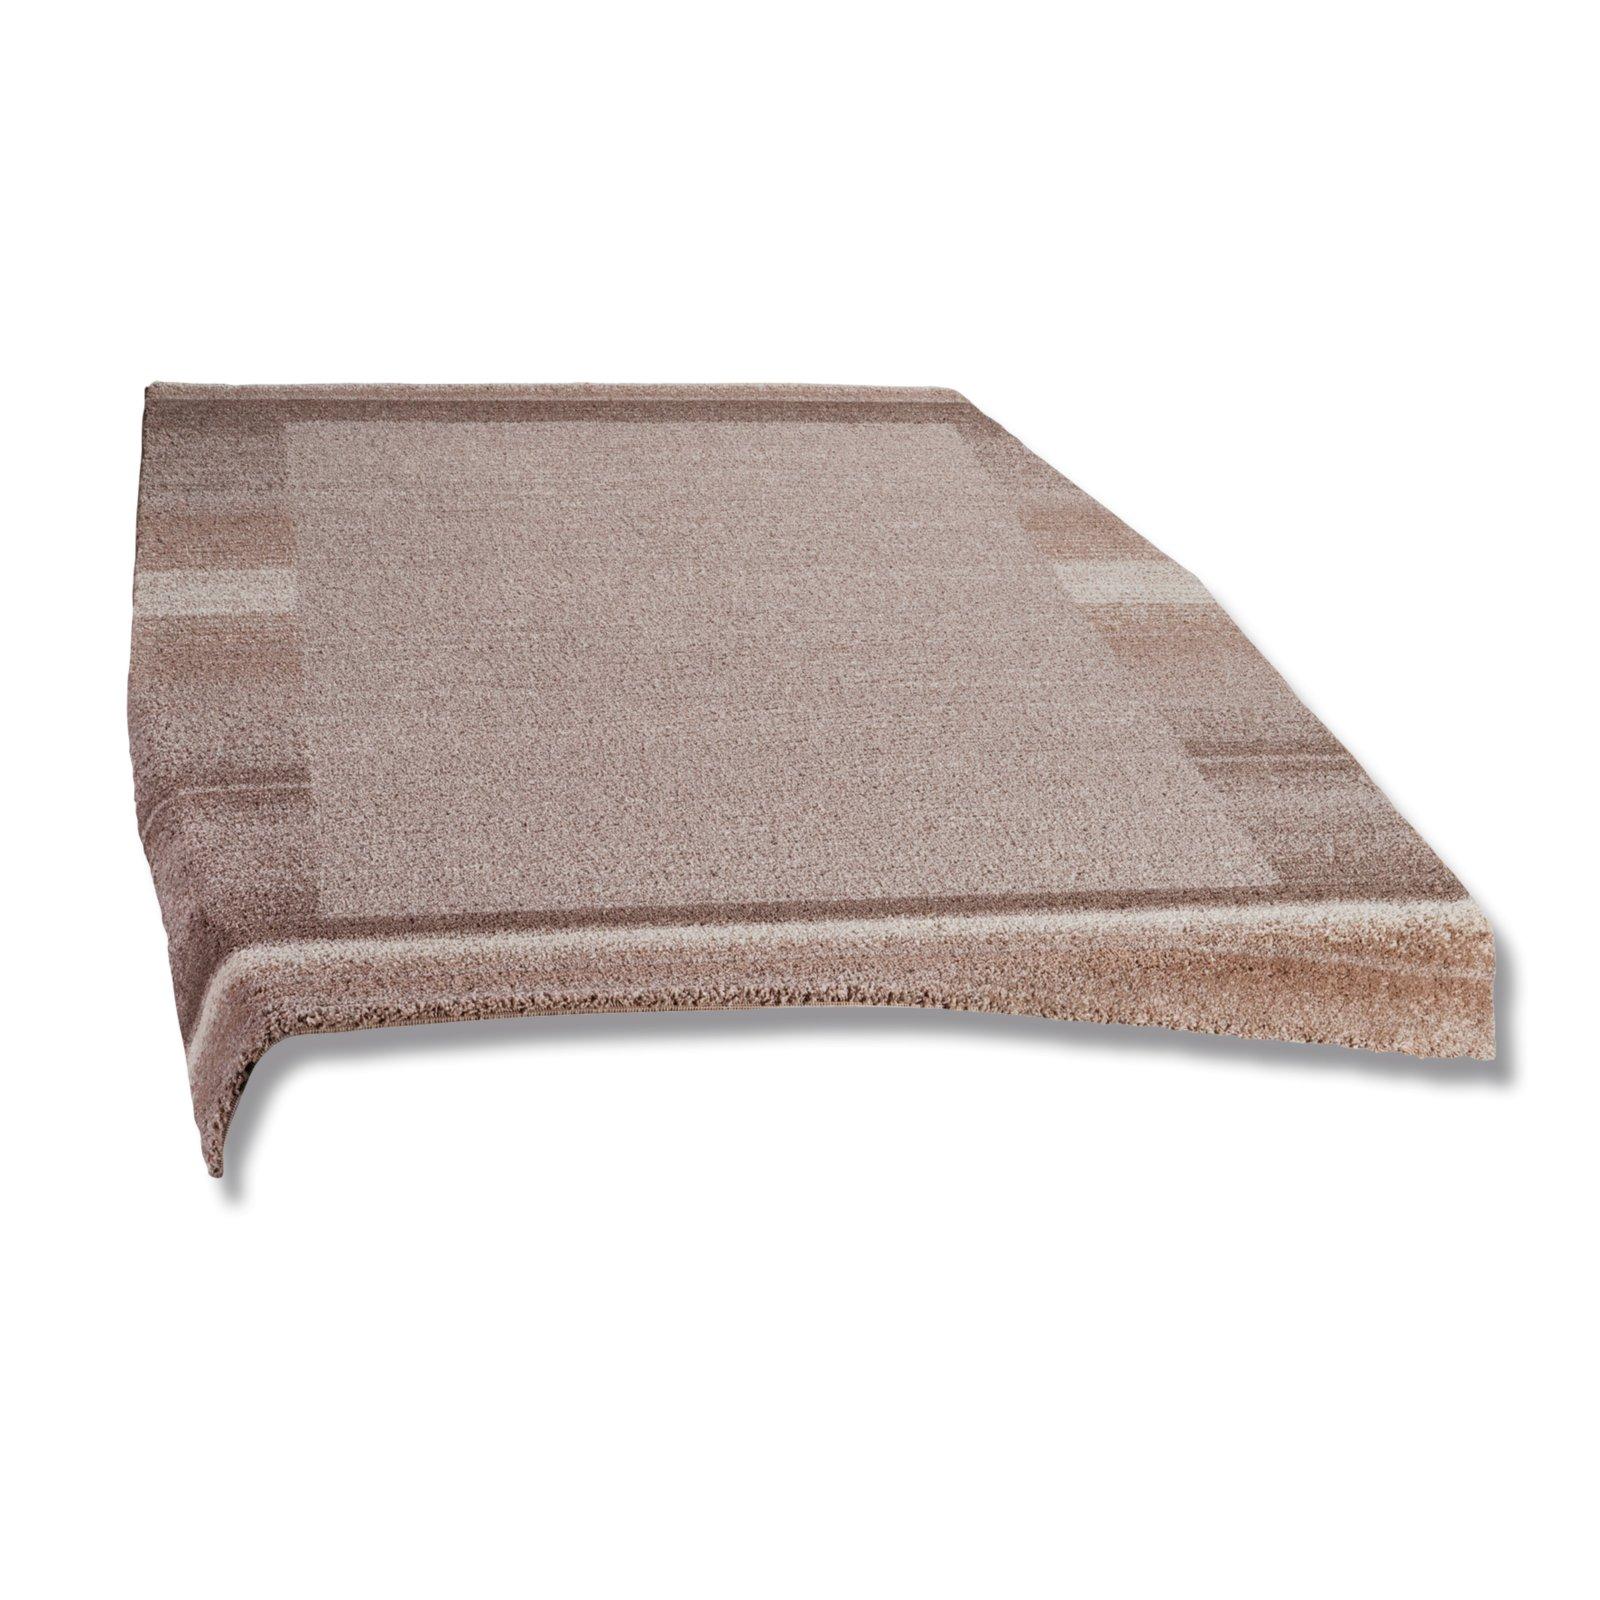 Teppich WIEN  natur  60×110 cm  Gemusterte Teppiche